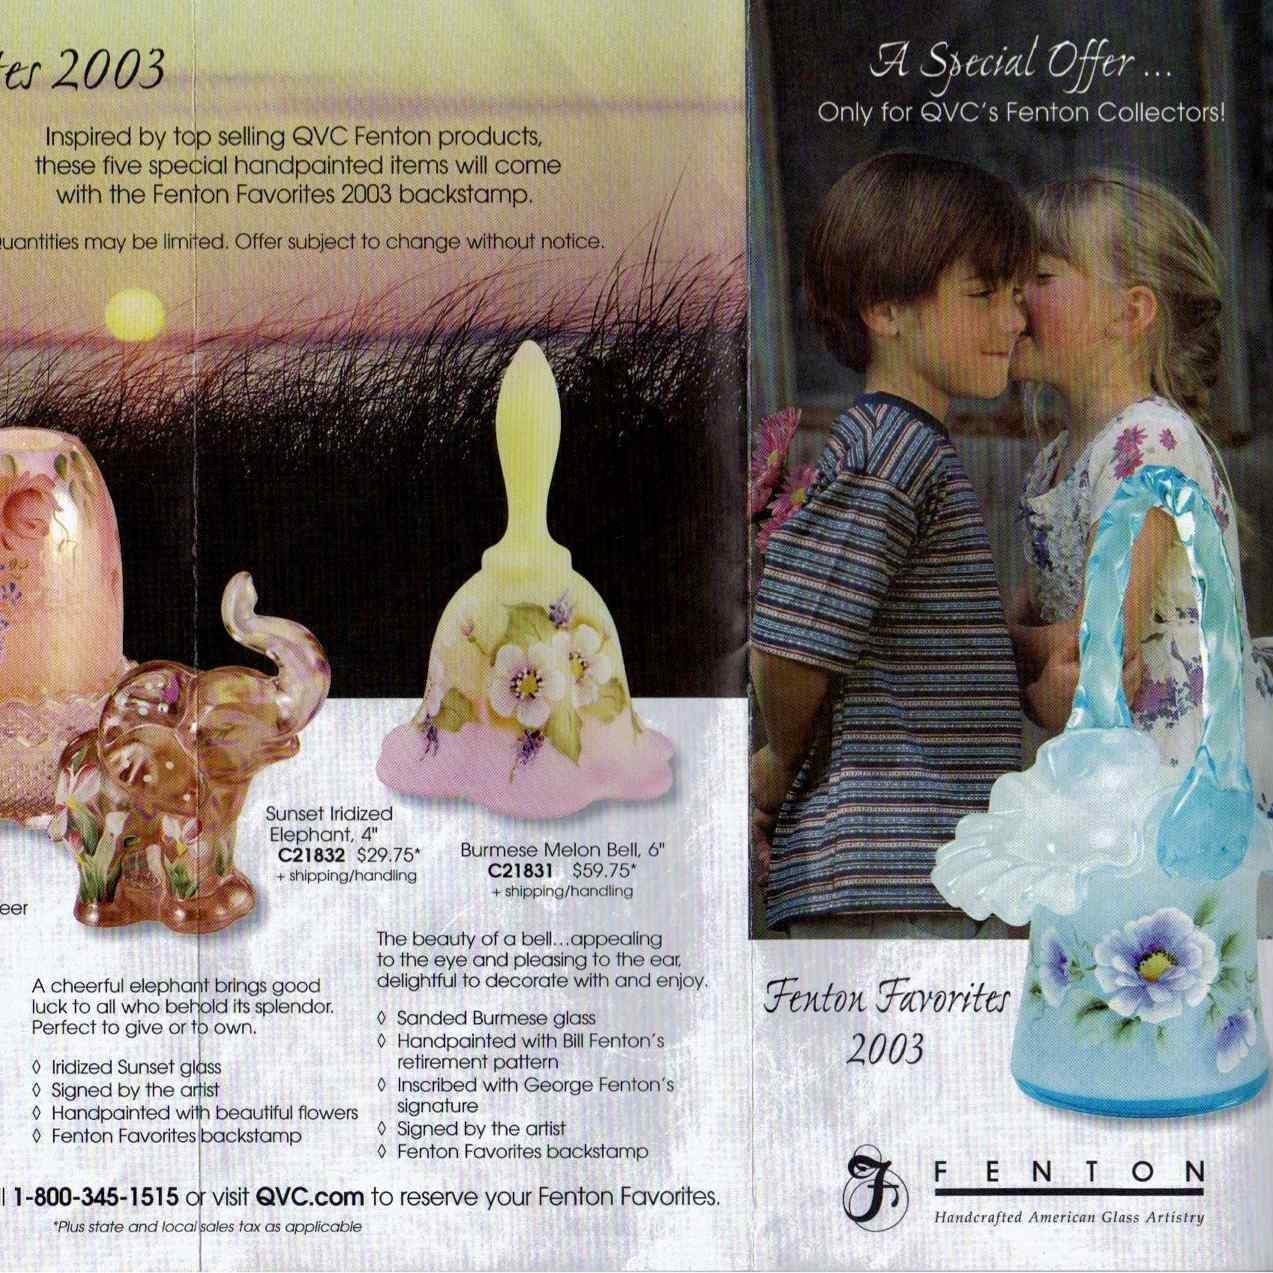 2003 Fenton Favorites